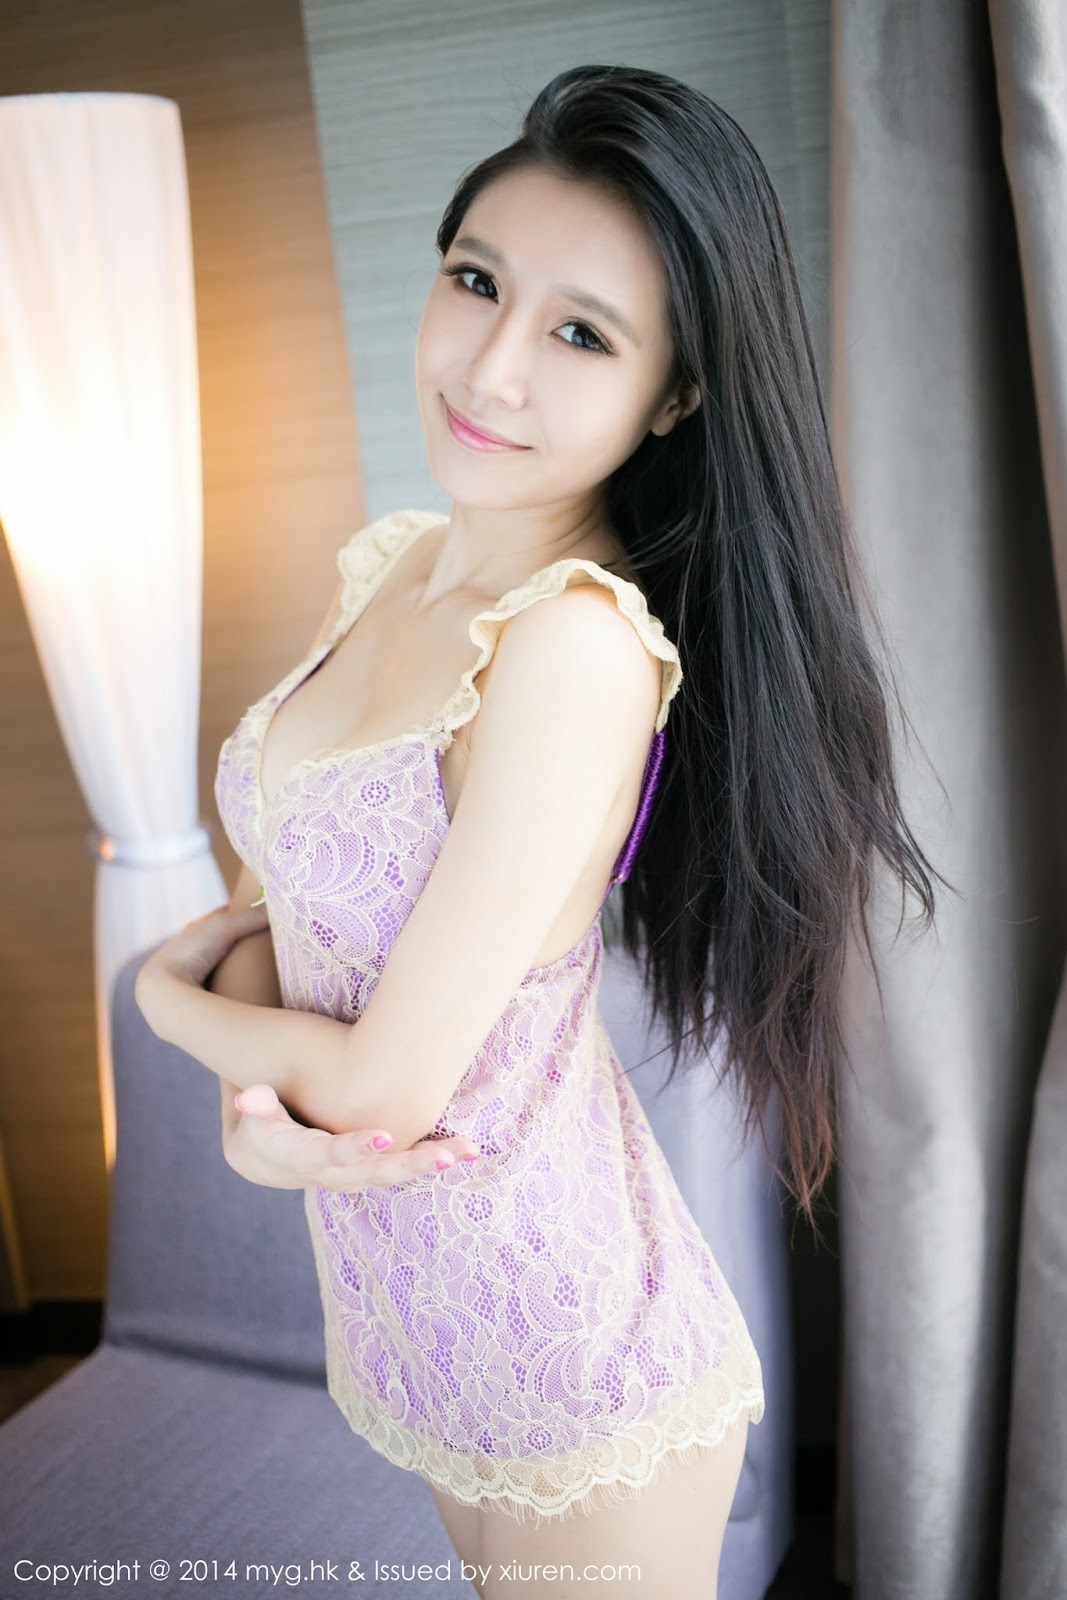 Sexy Photo MYGIRL VOL.59 Nude Girl